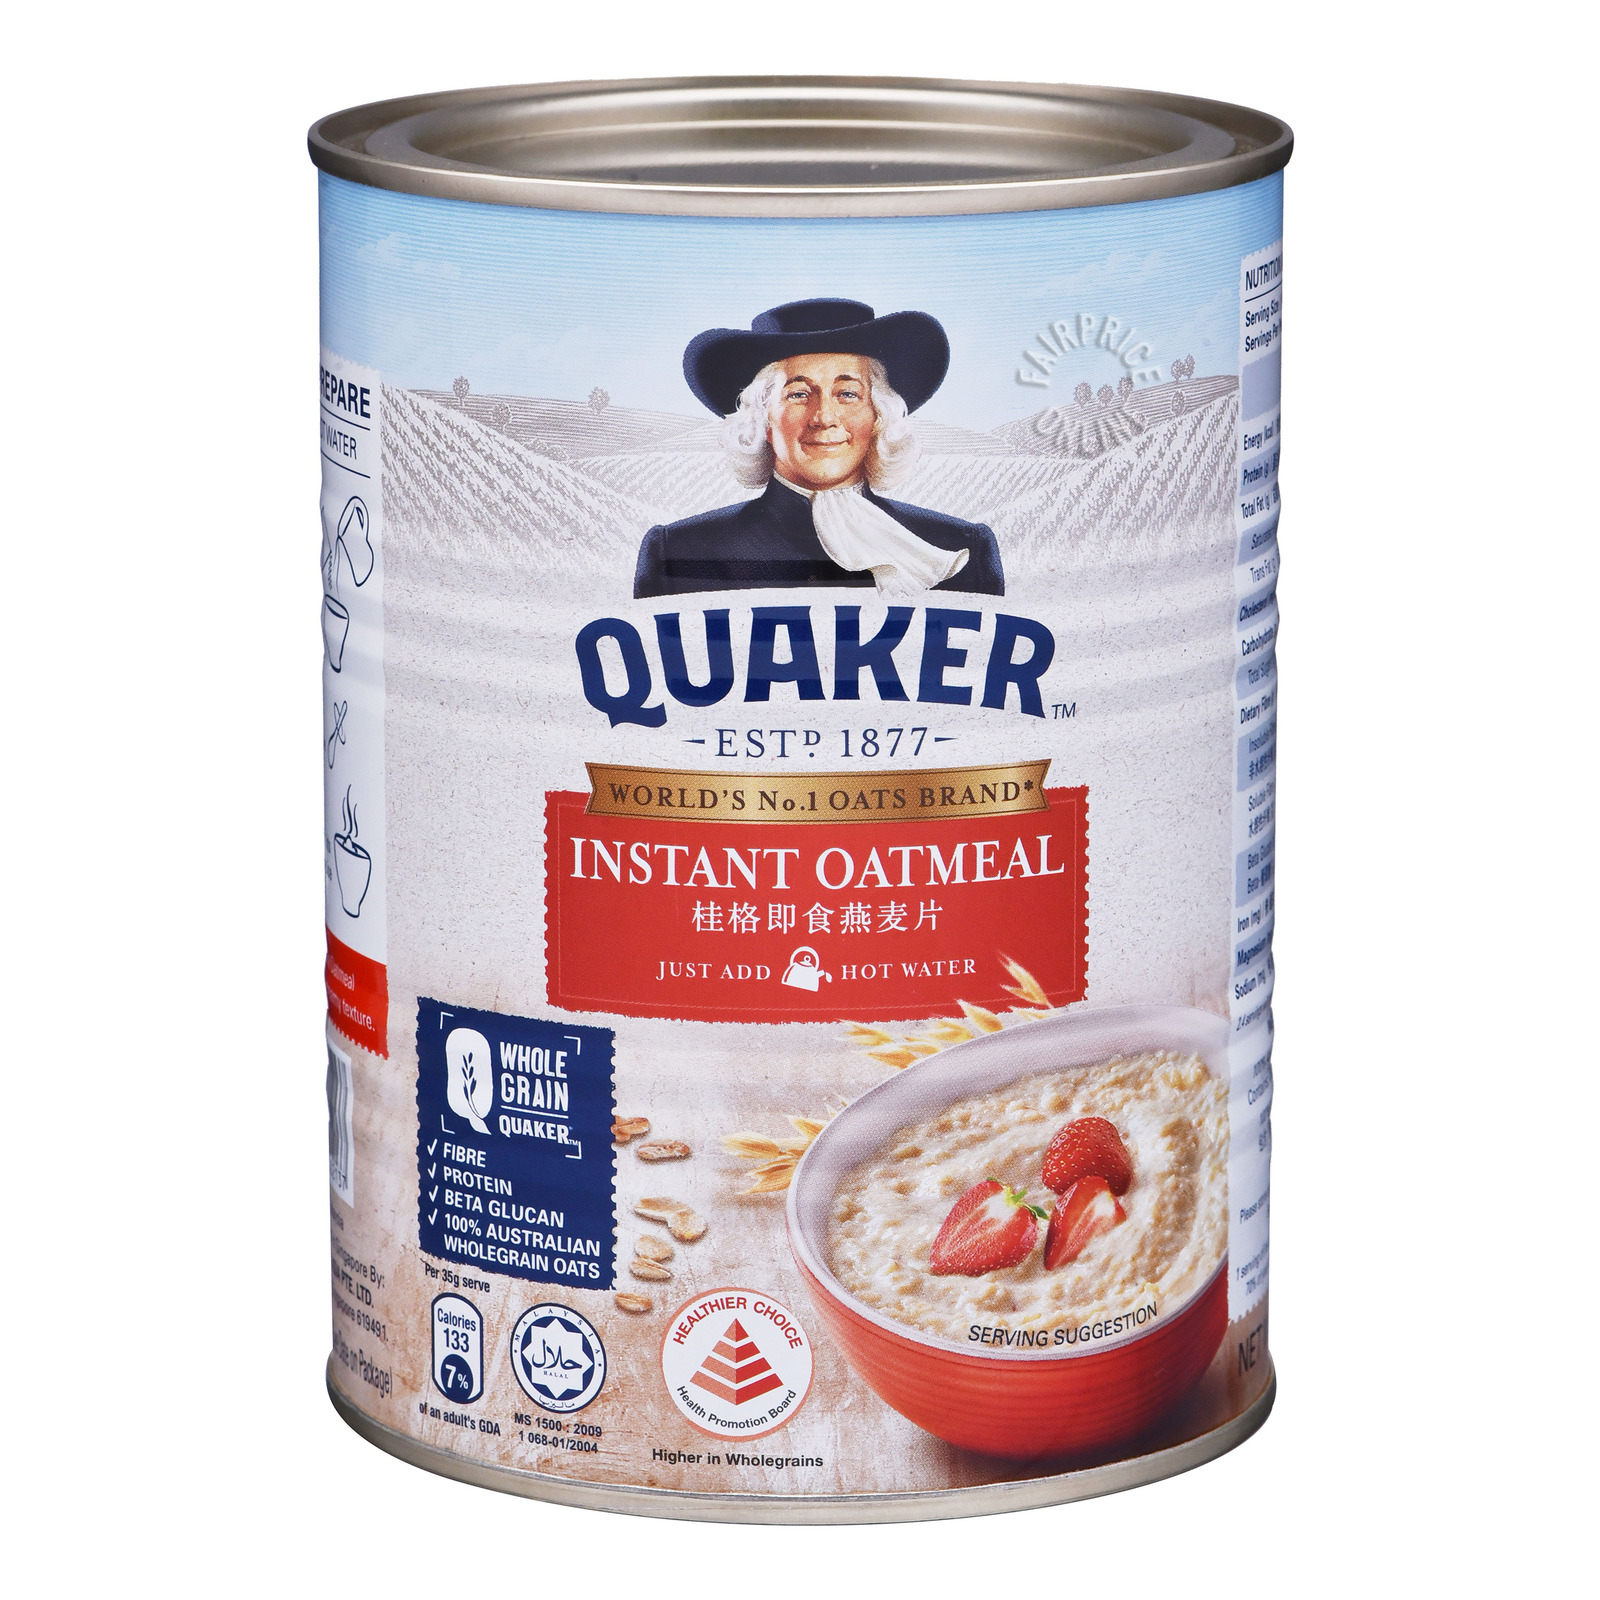 Quaker 100% Wholegrain Oatmeal - Instant